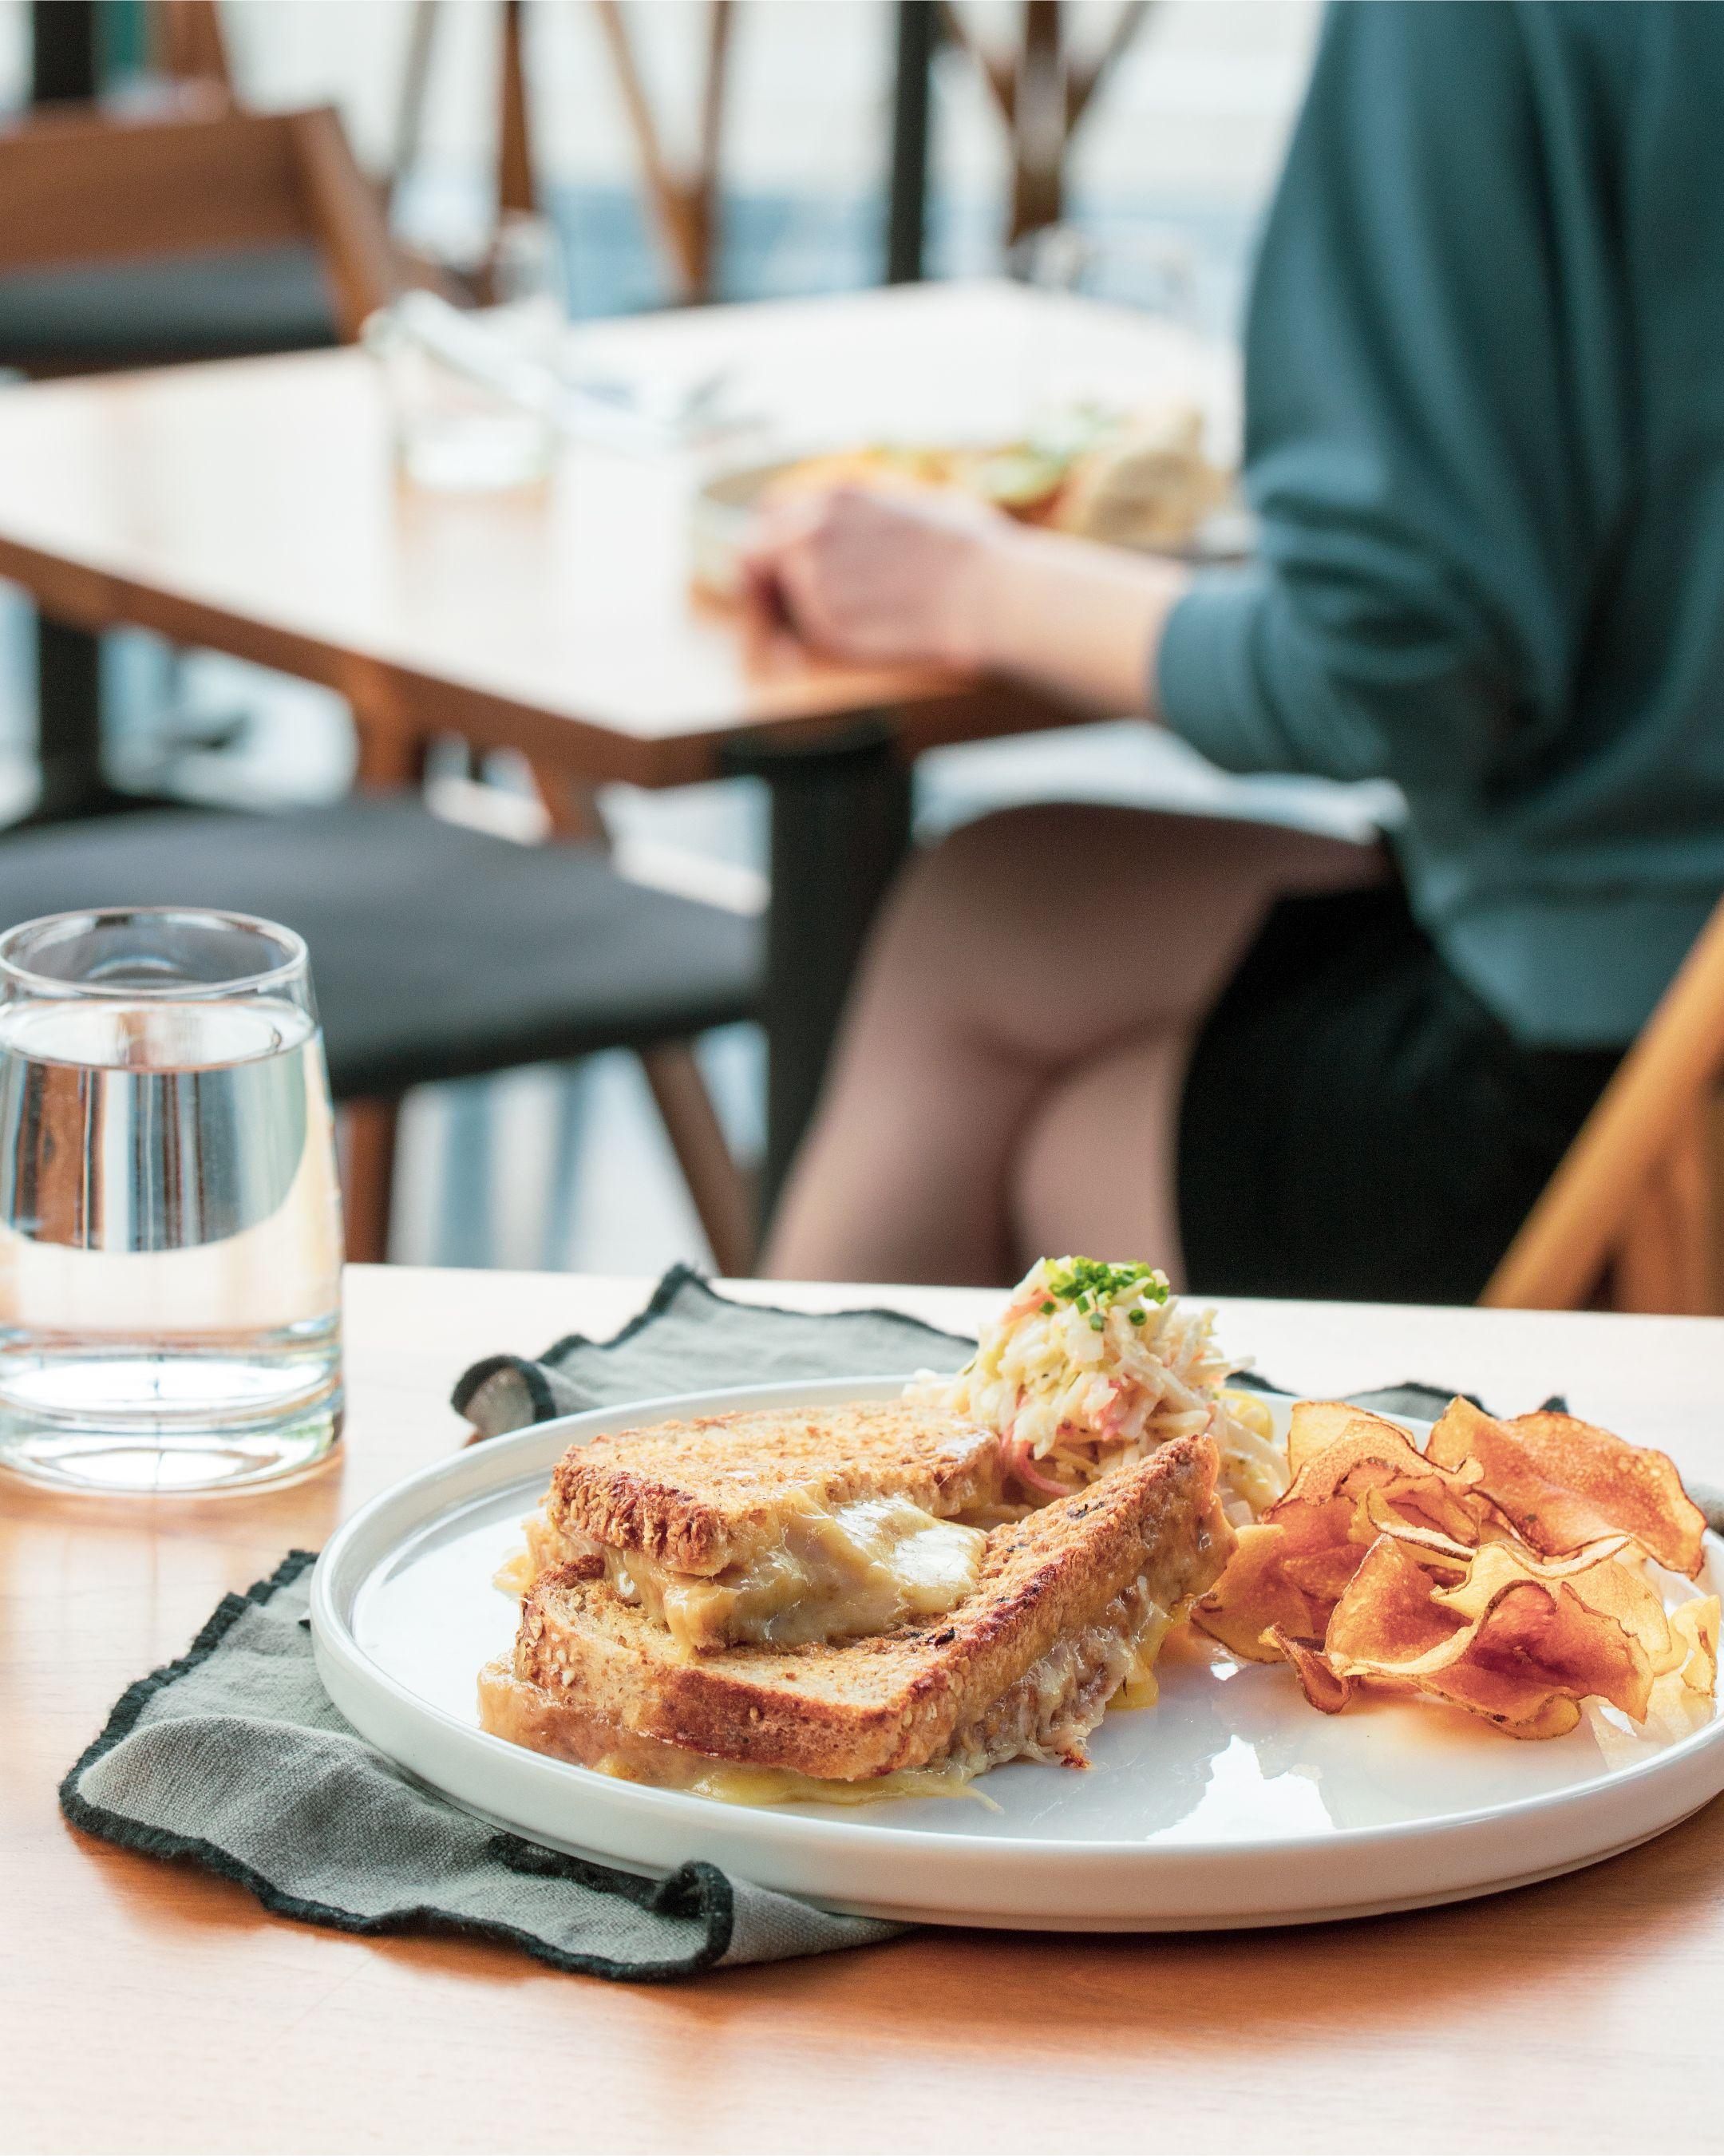 Cafe Quebecor Signe Restos Plaisirs In 2020 Food Breakfast Toast